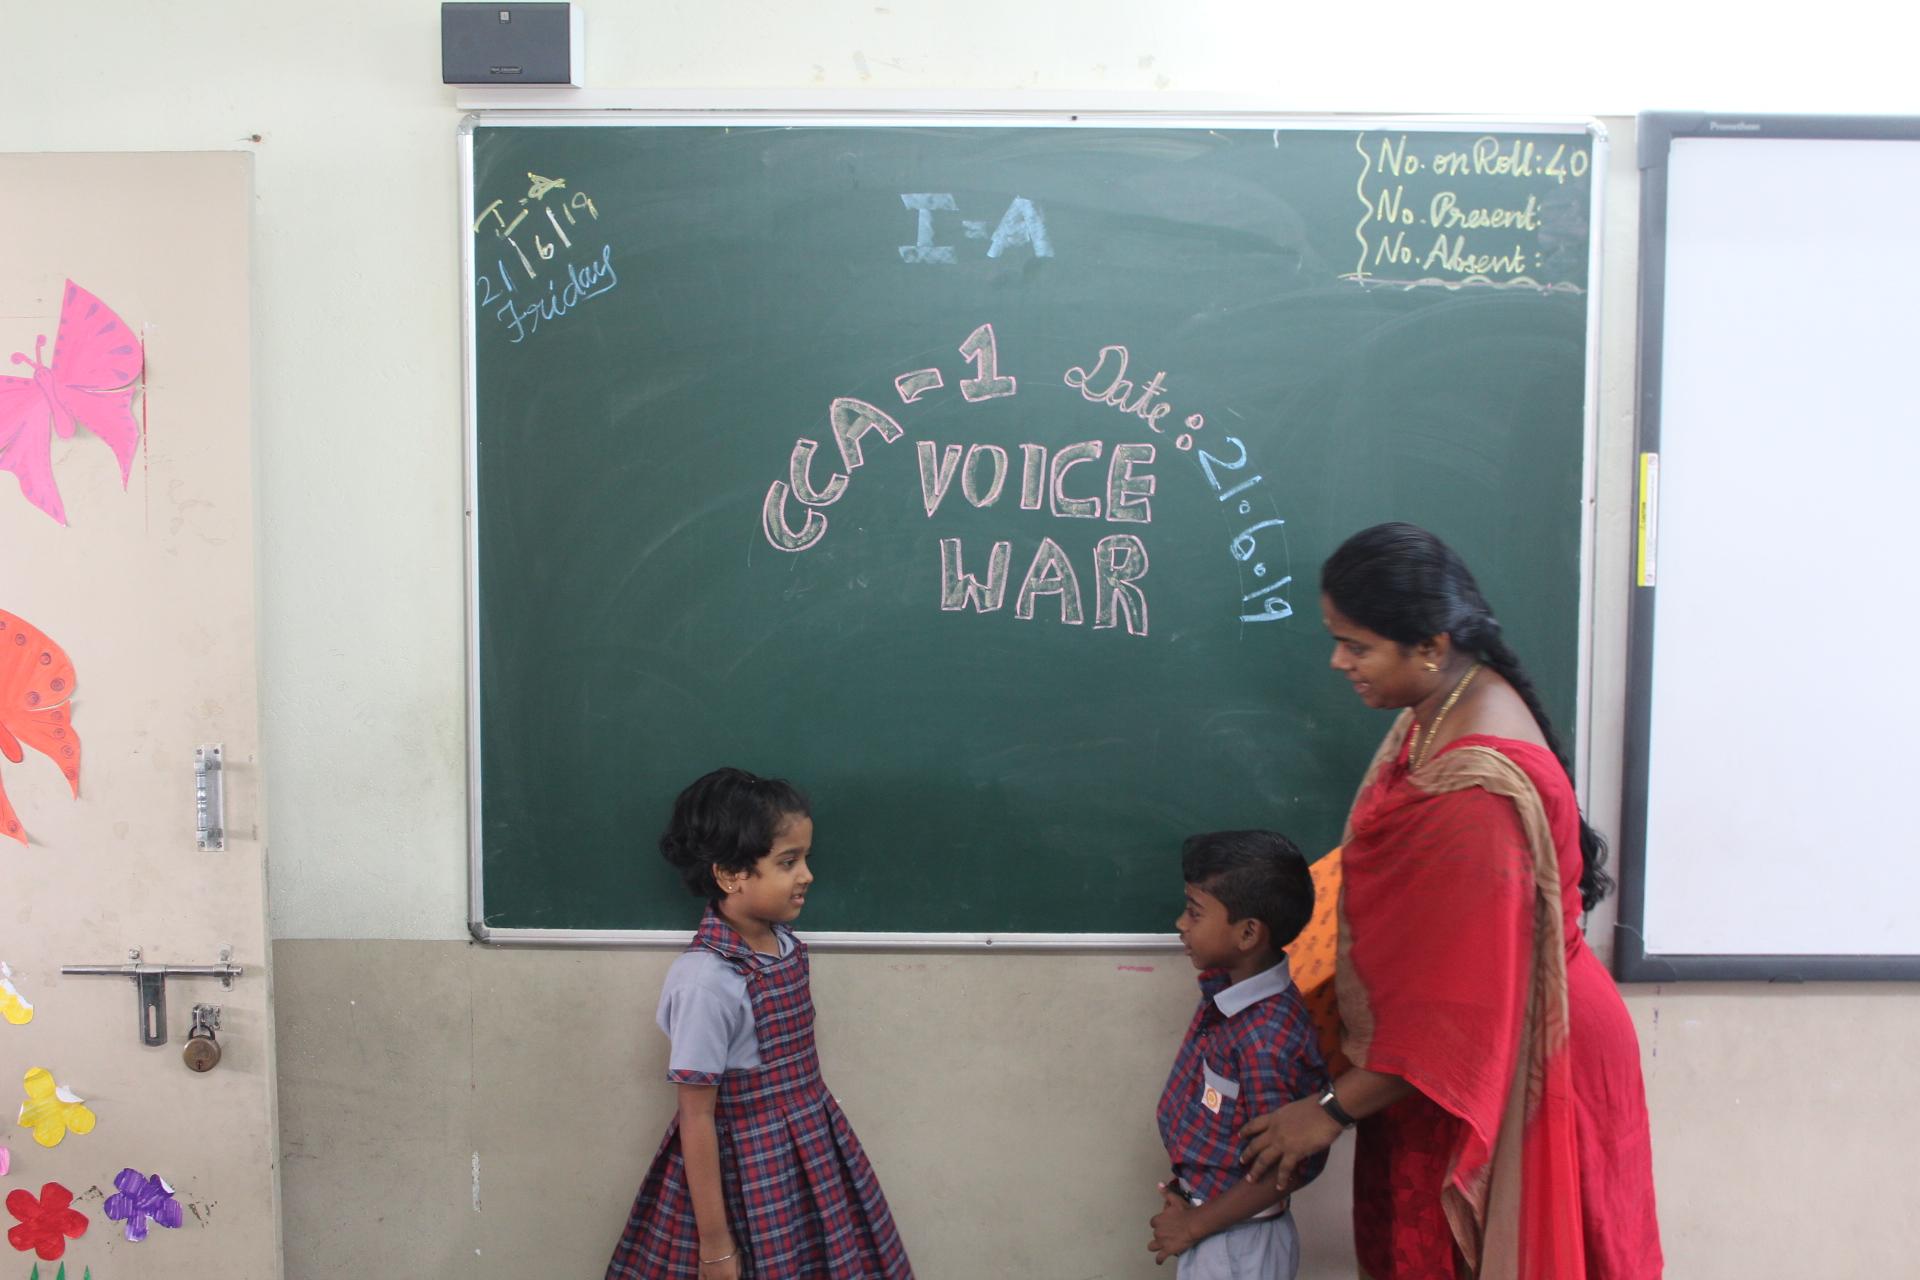 Voice war between two cute kids